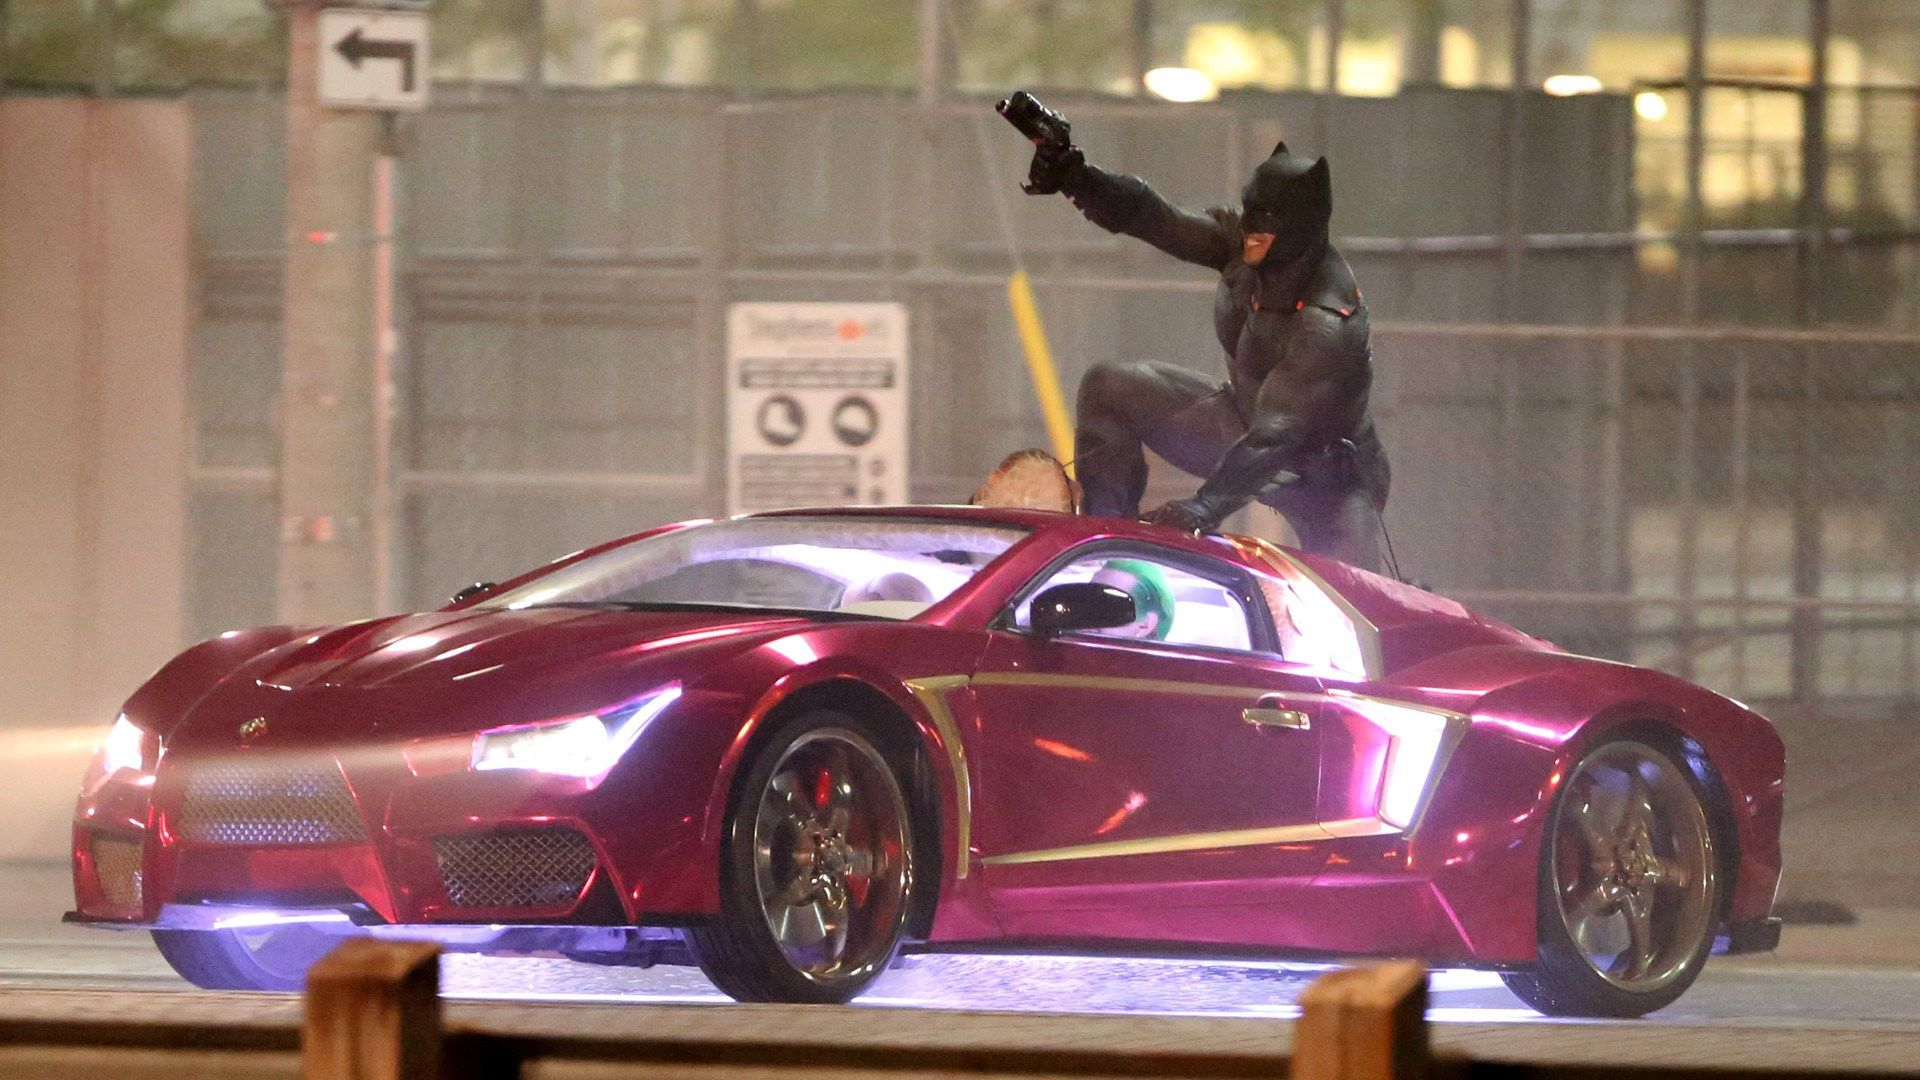 39 suicide squad 39 says goodbye to toronto with epic batman vs joker set video batman news. Black Bedroom Furniture Sets. Home Design Ideas